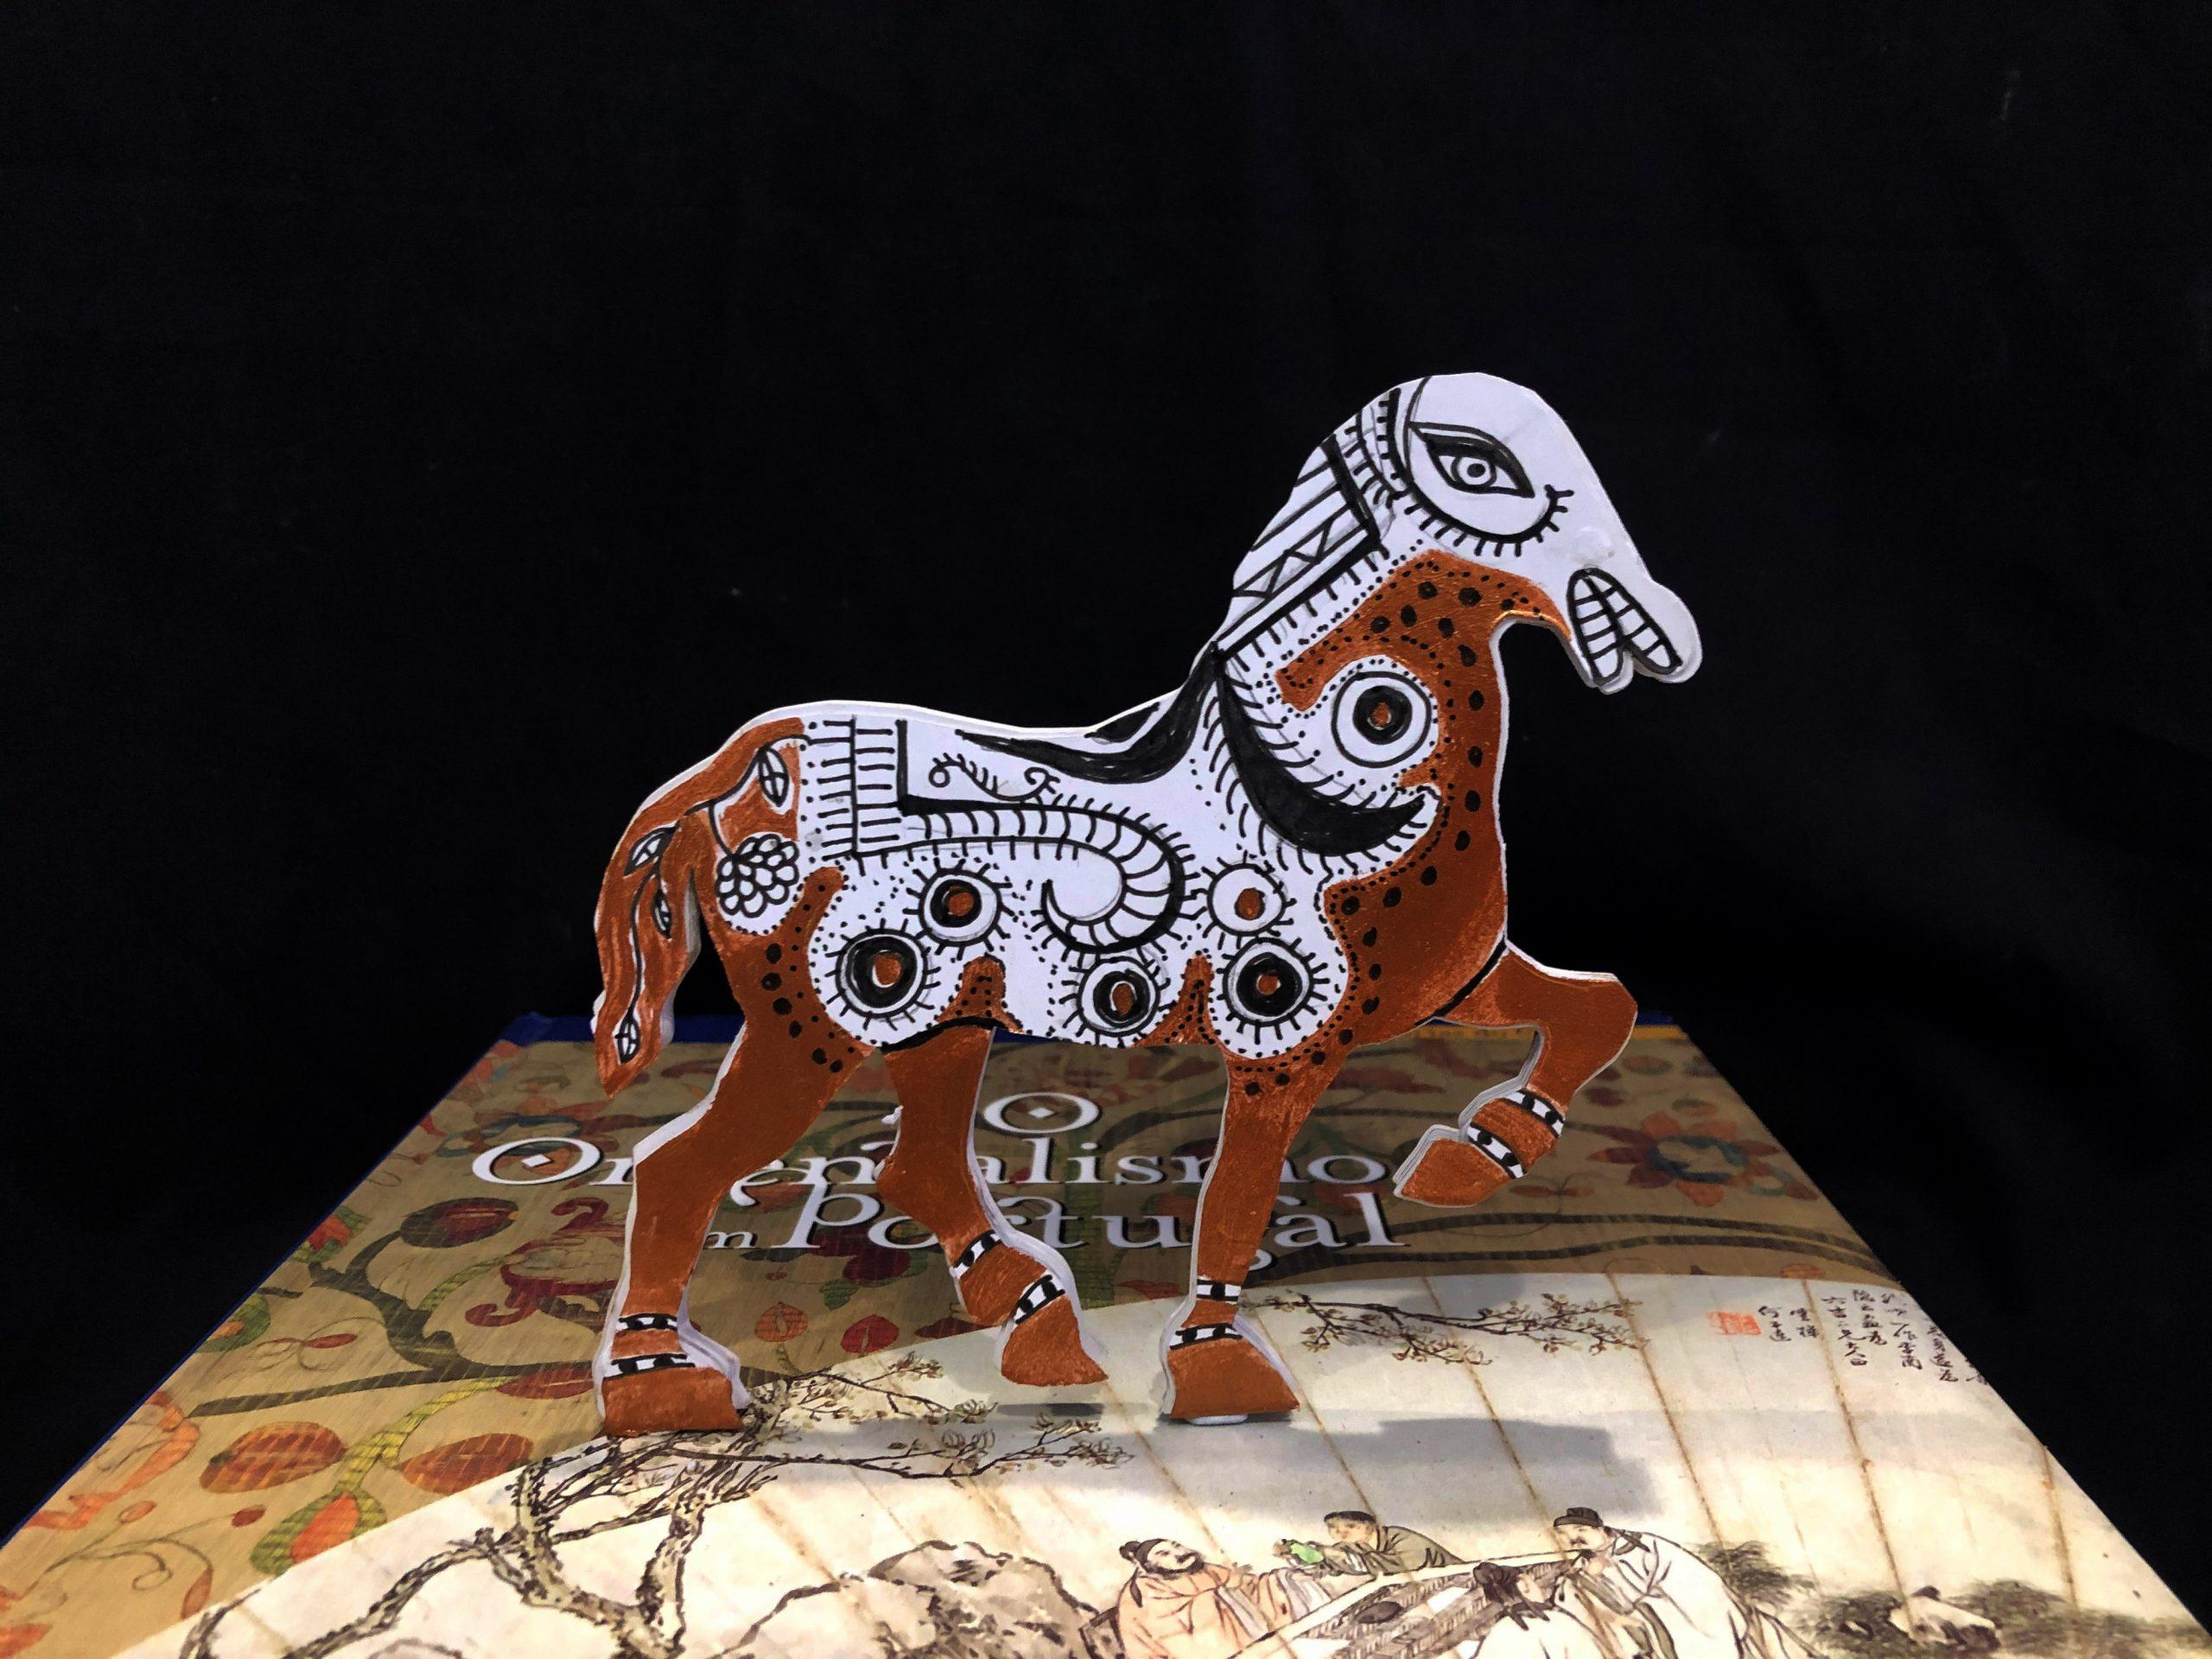 Audrey Fernandes Satar, Mapa, 2021, Paperclay, paint, 25 x 25 cm, Photo: Arif Satar